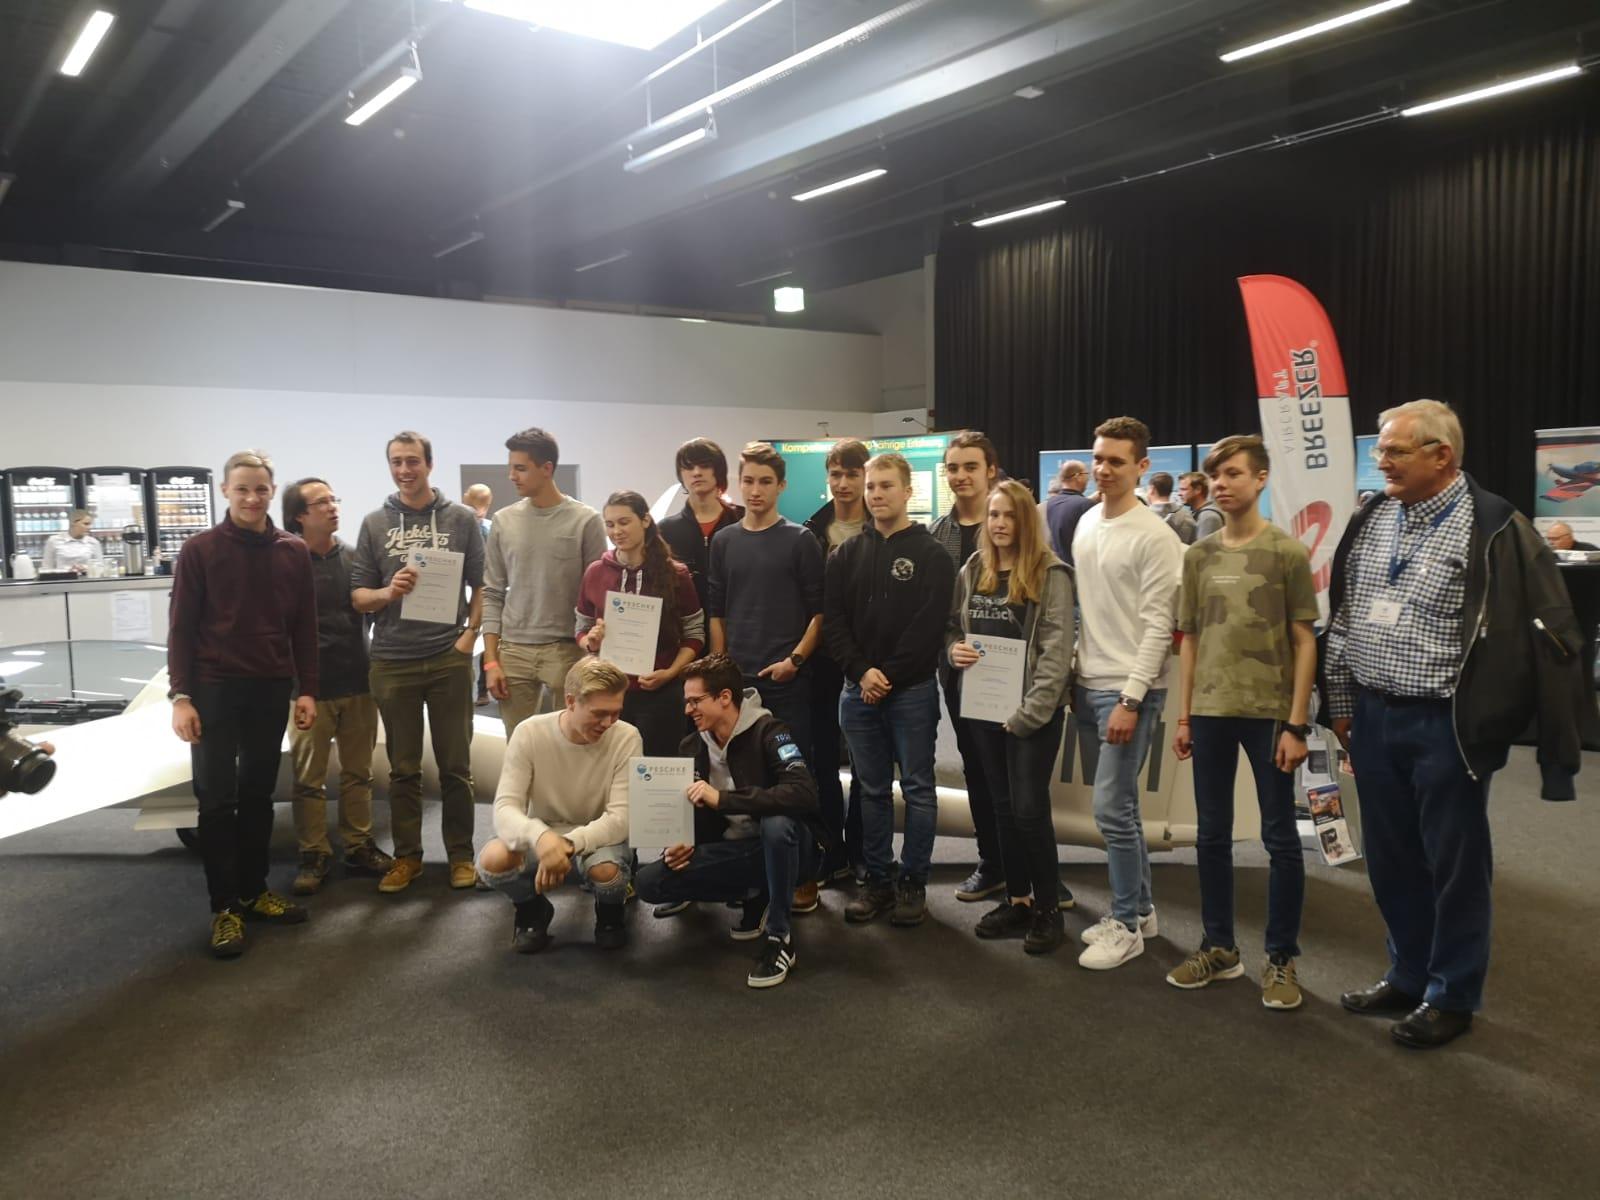 Verleihung des Peschke Jugendförderpreis 2019